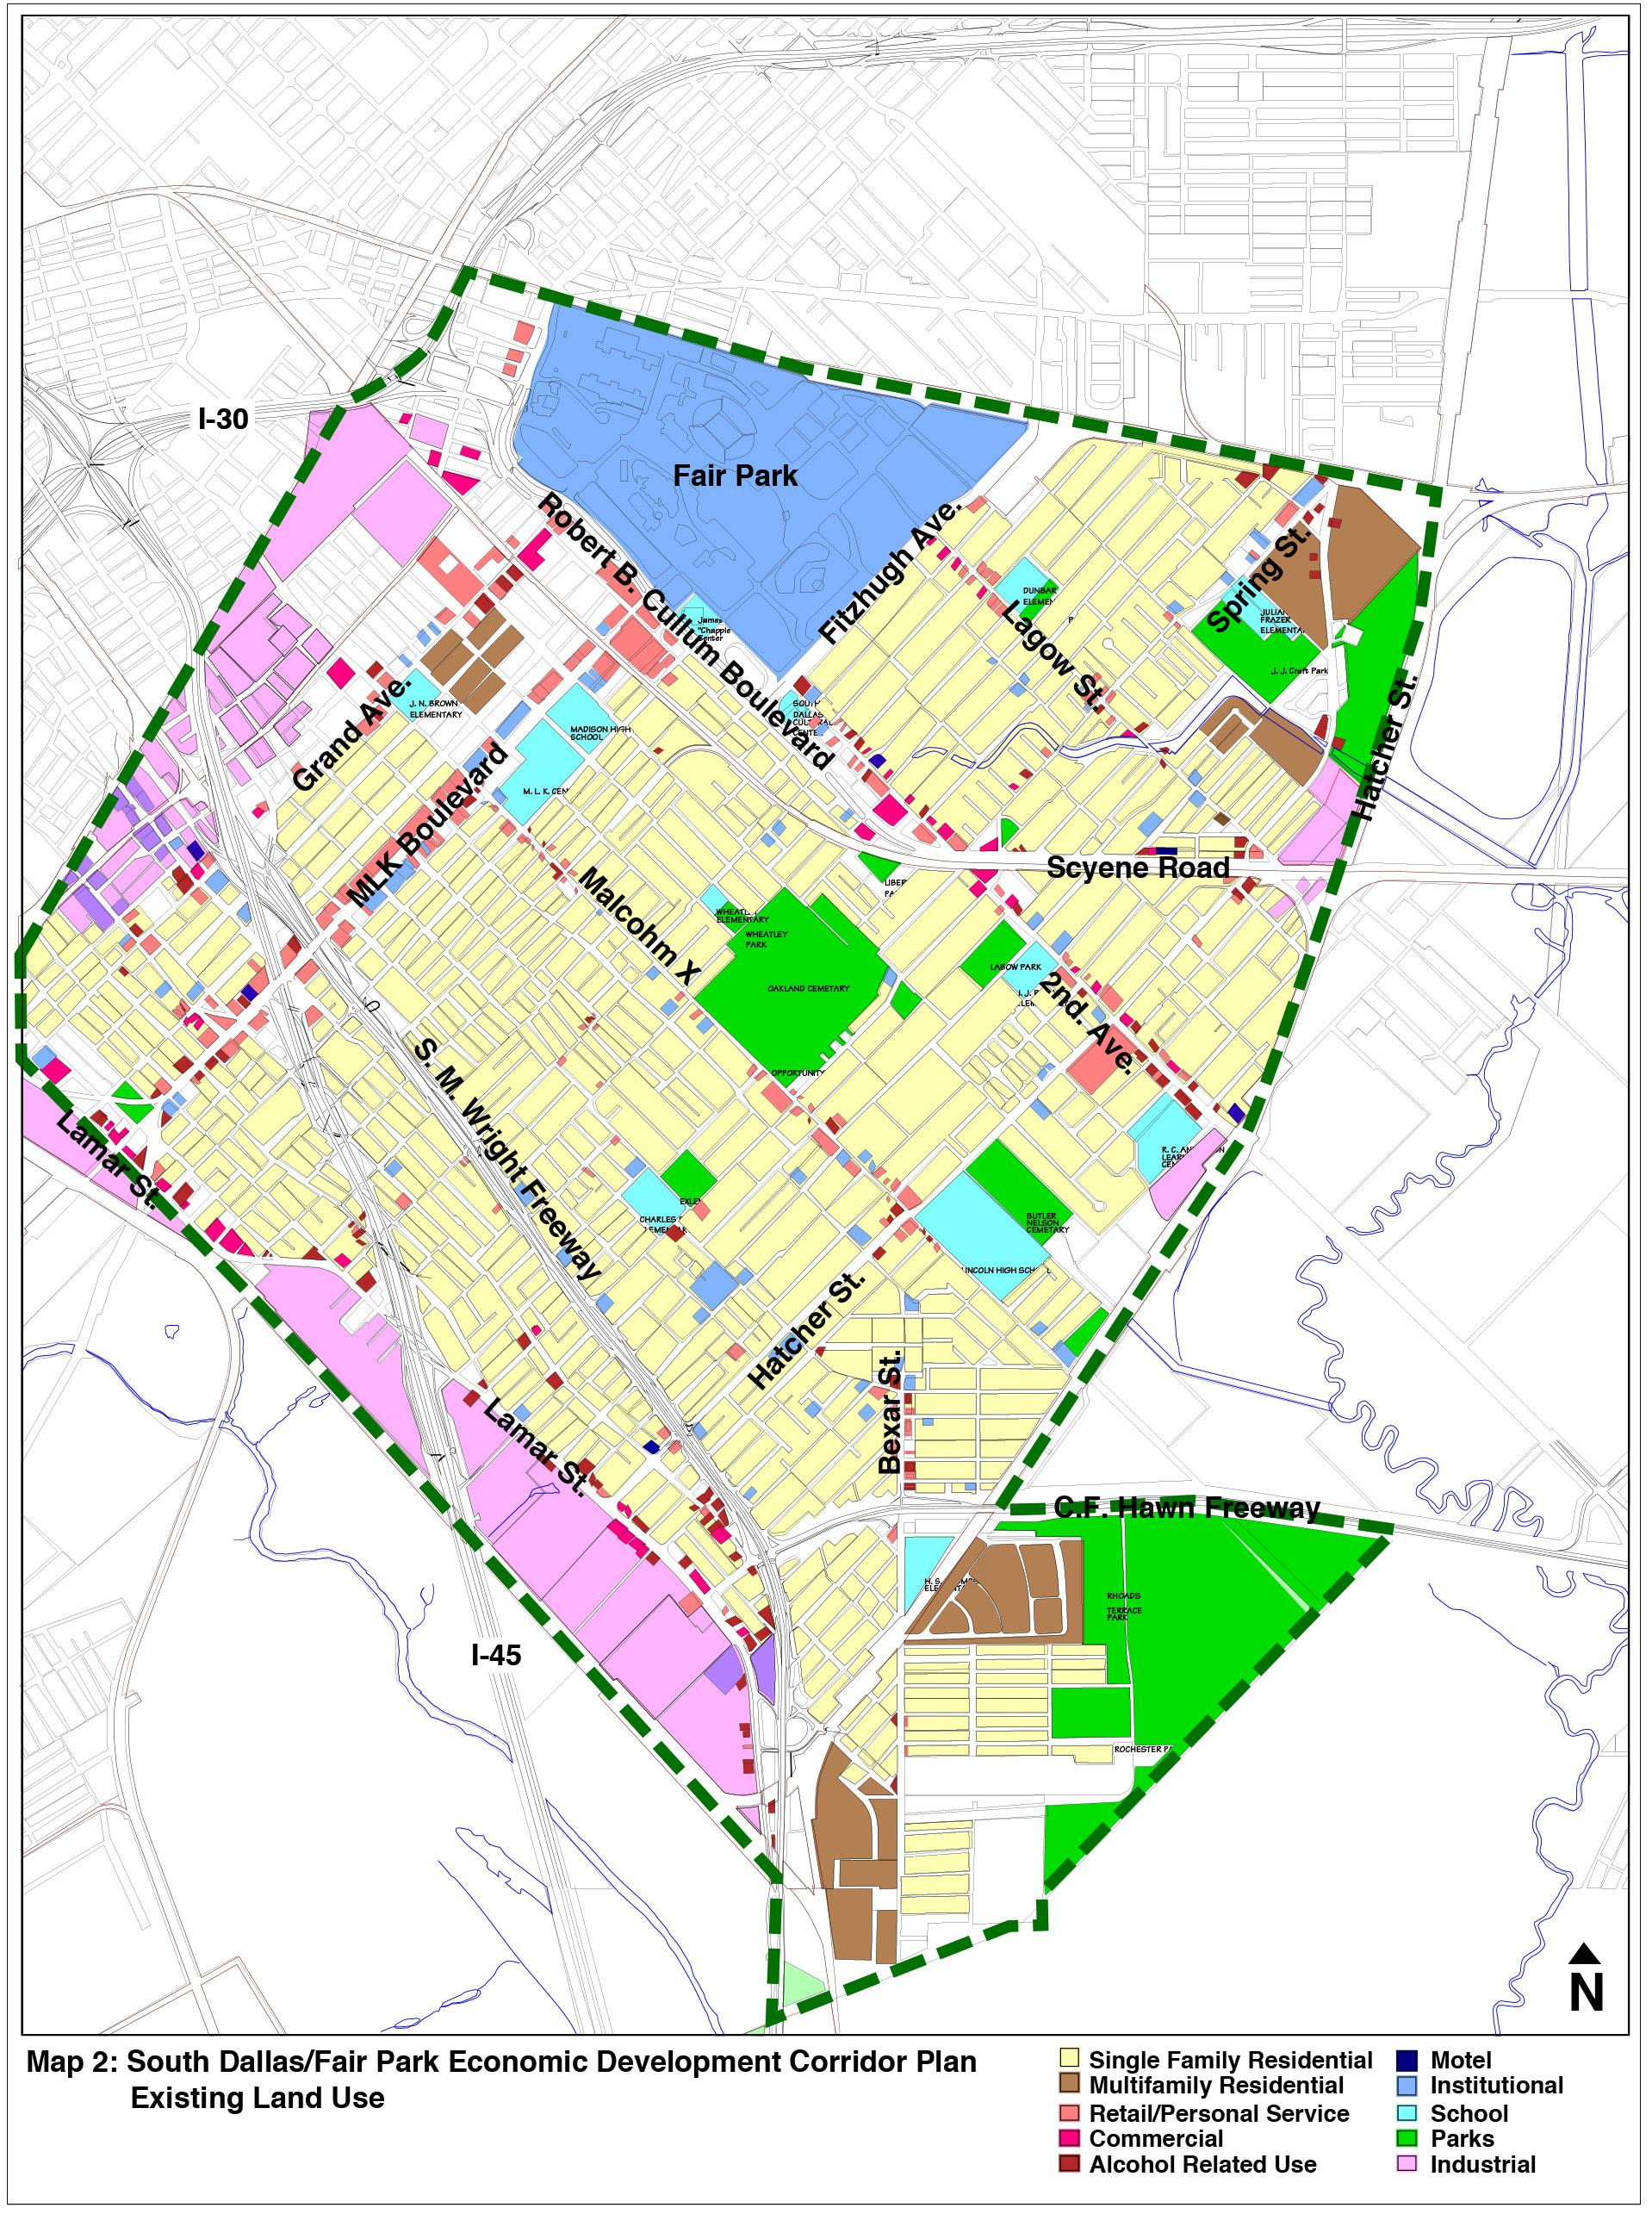 South Dallas Fair Park Economic Development Corridor